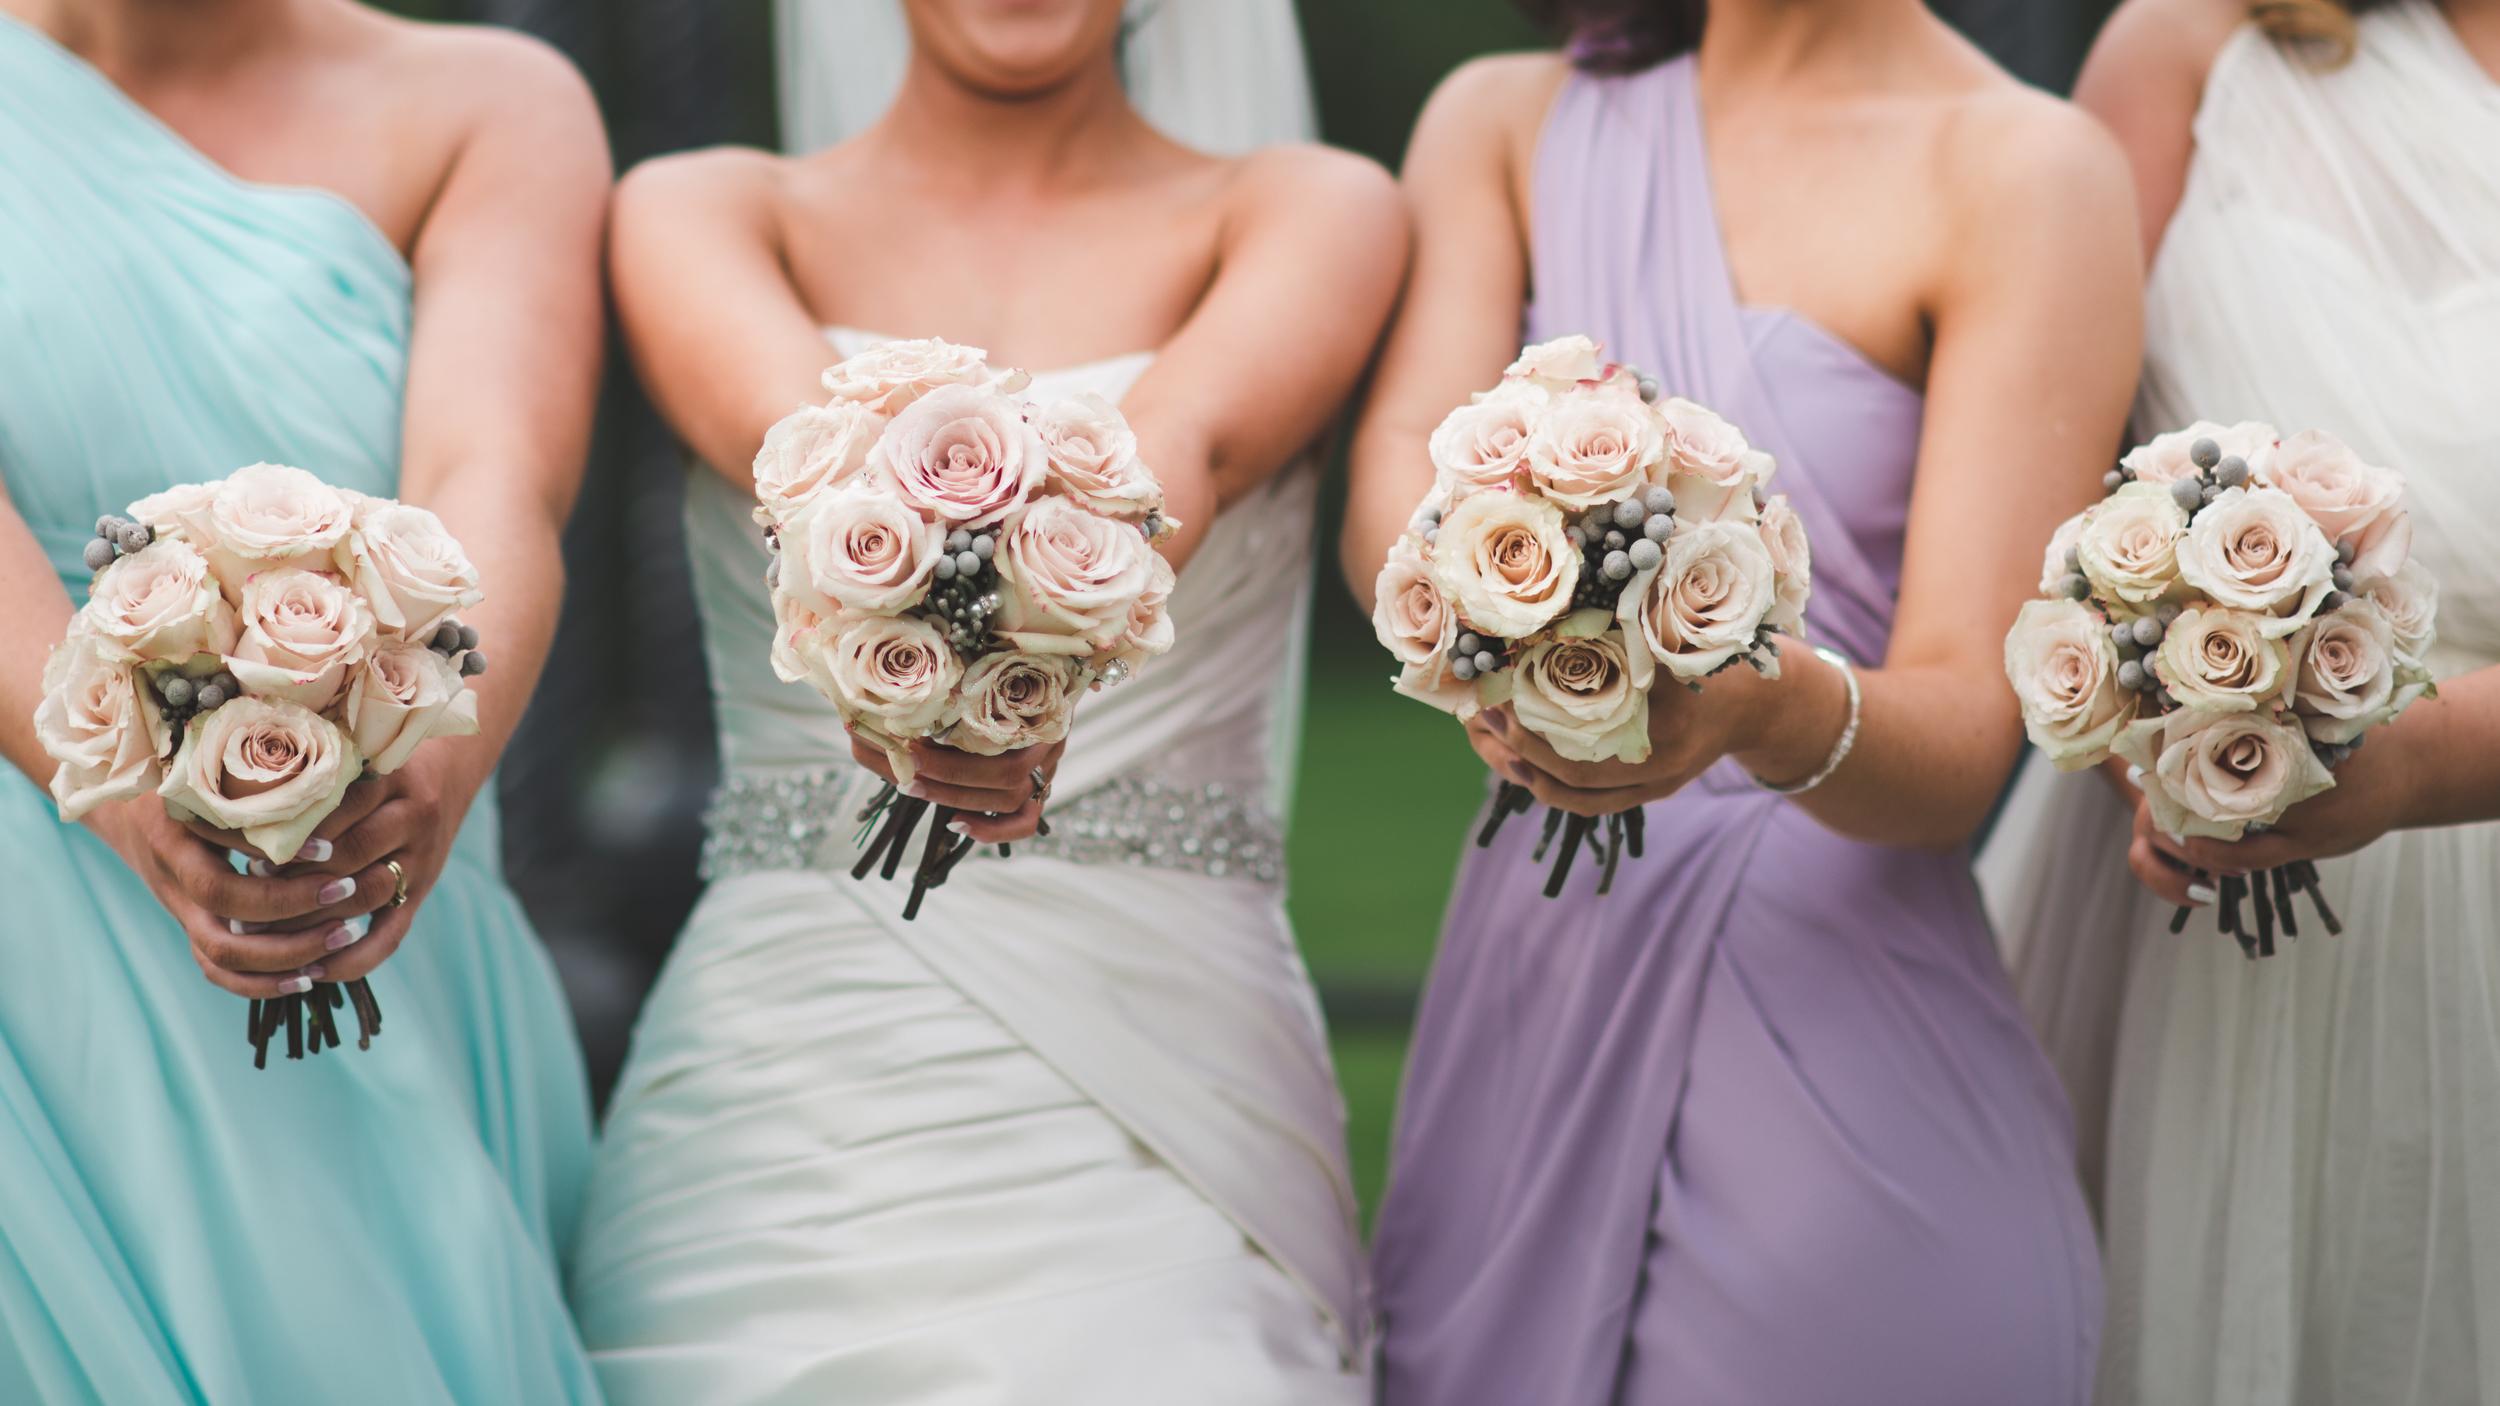 Northern_Ireland_Wedding_Photographer_Purephotoni_Dunsilly_Hotel_Wedding_Bridesmaids_flowers